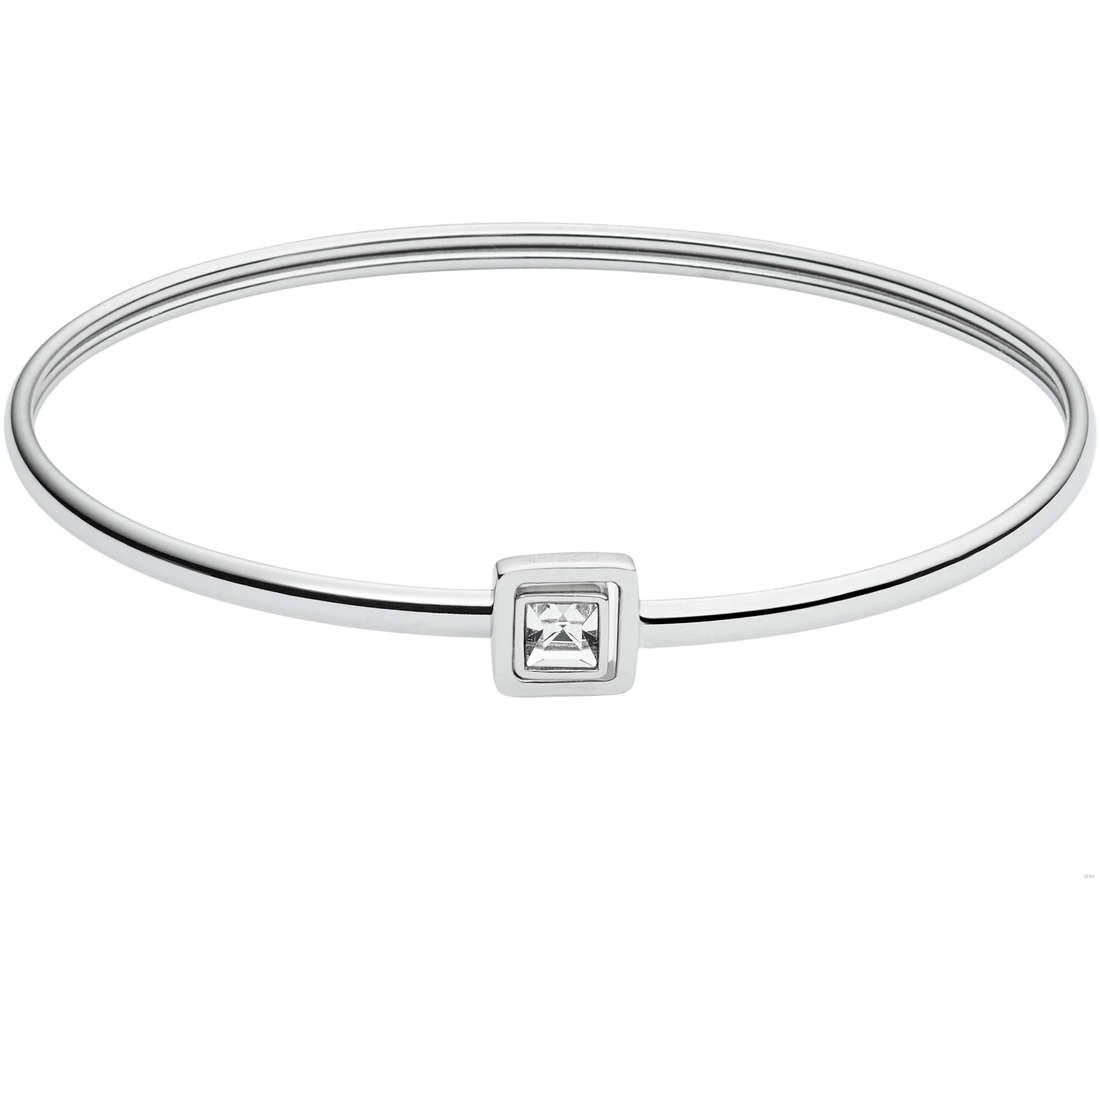 bracelet woman jewellery Fossil Vintage Iconic JF02414040